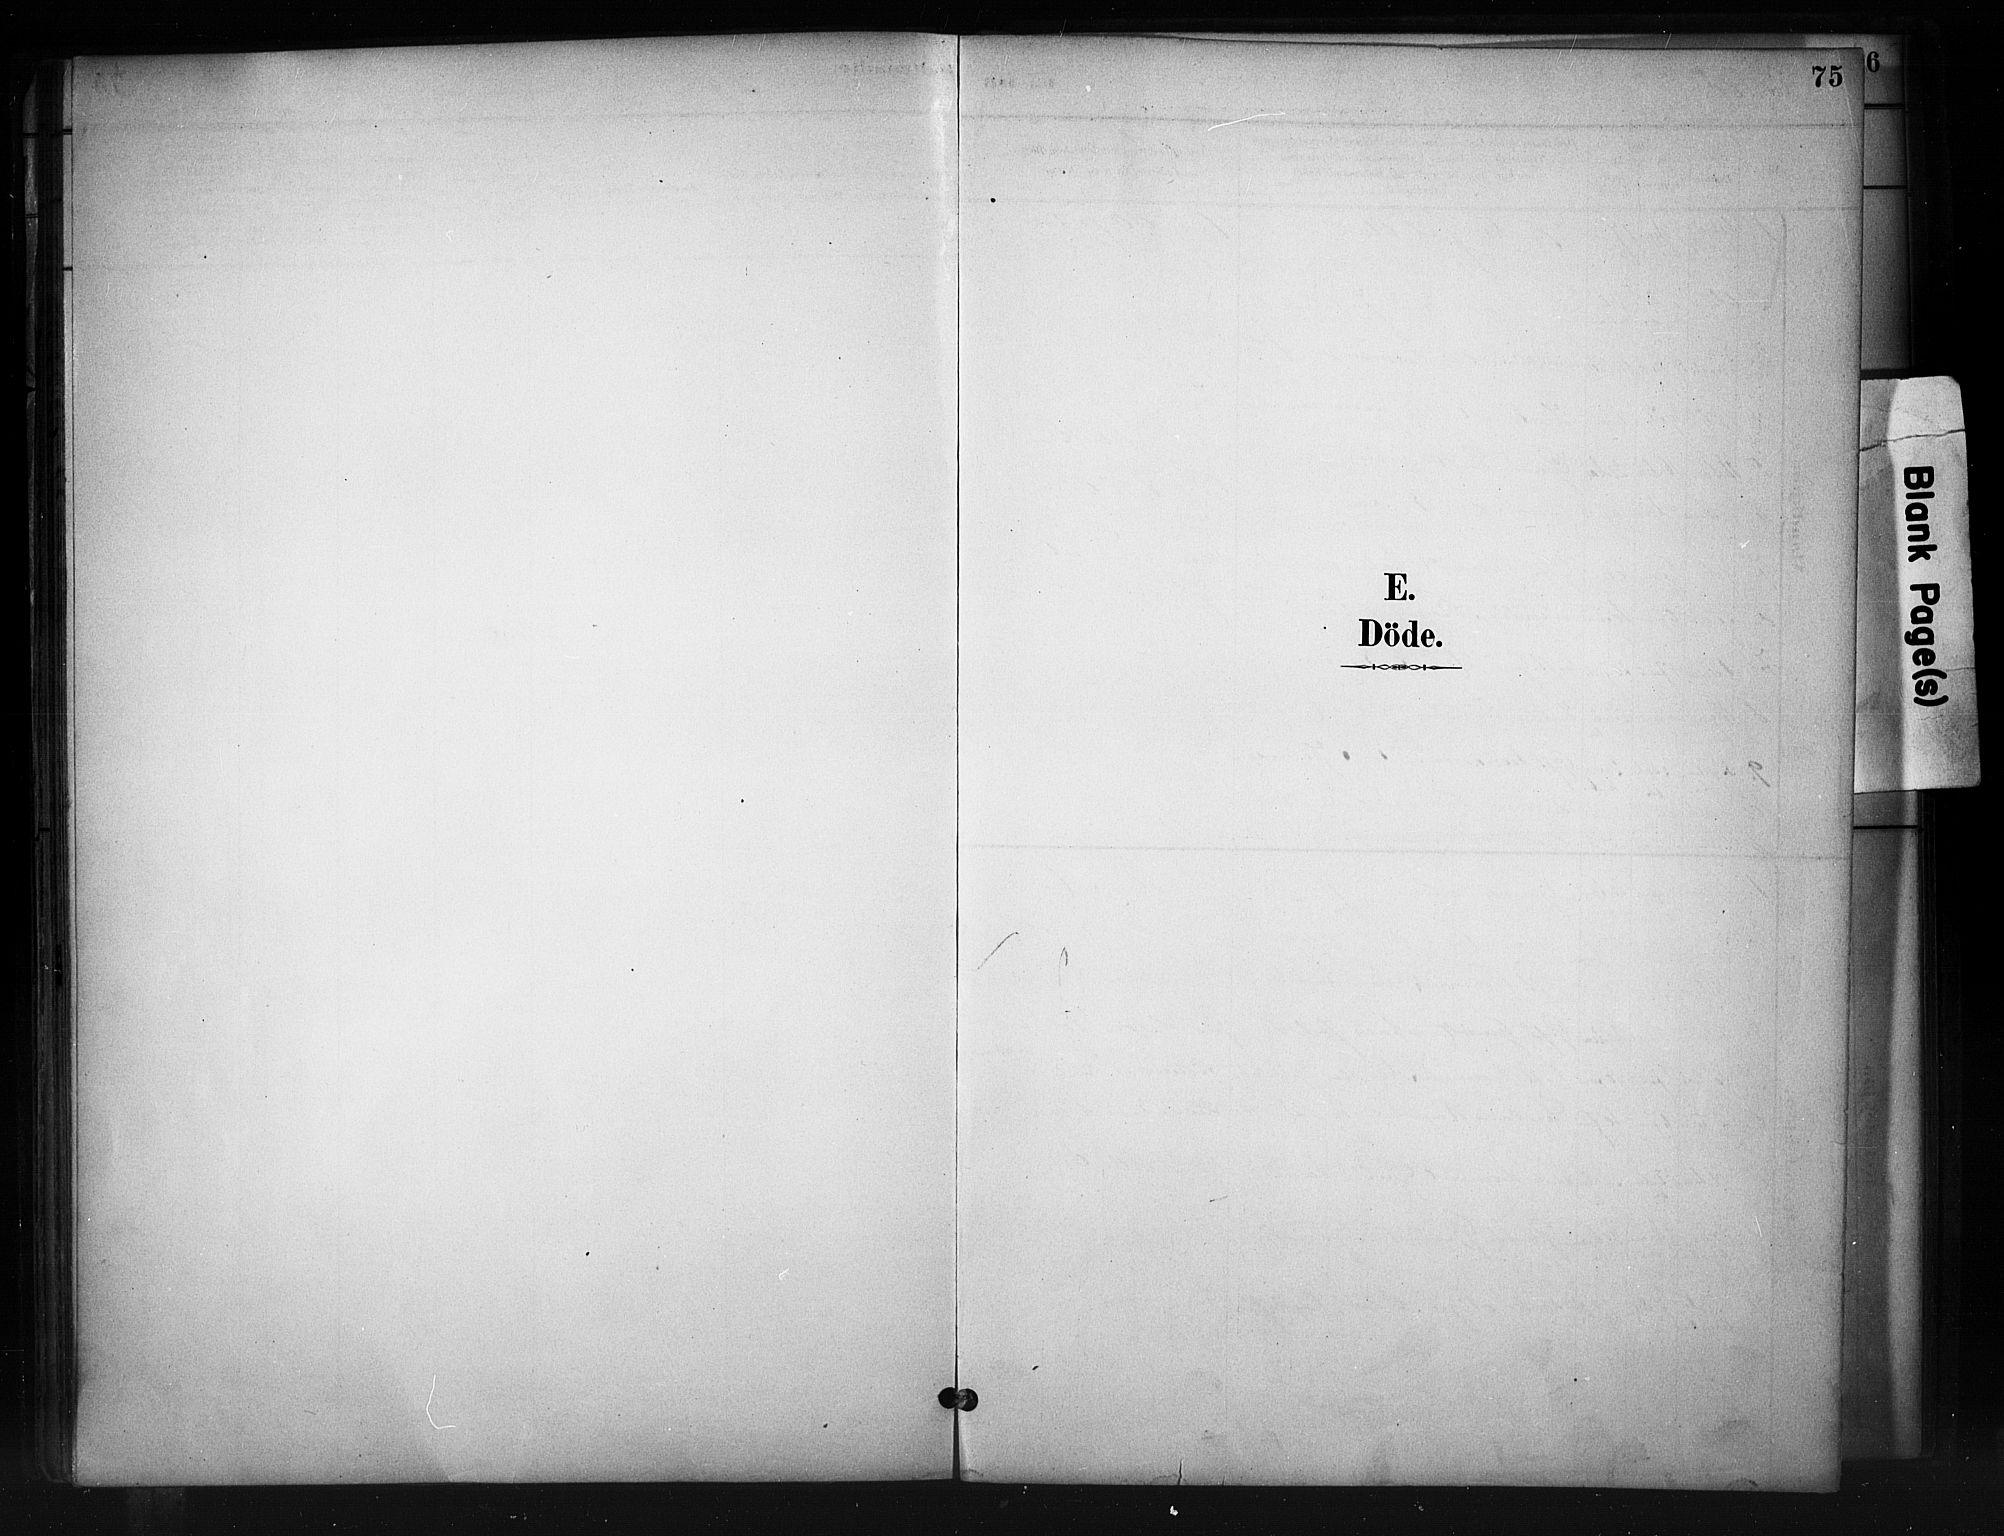 SAH, Nord-Aurdal prestekontor, Ministerialbok nr. 10, 1883-1896, s. 75